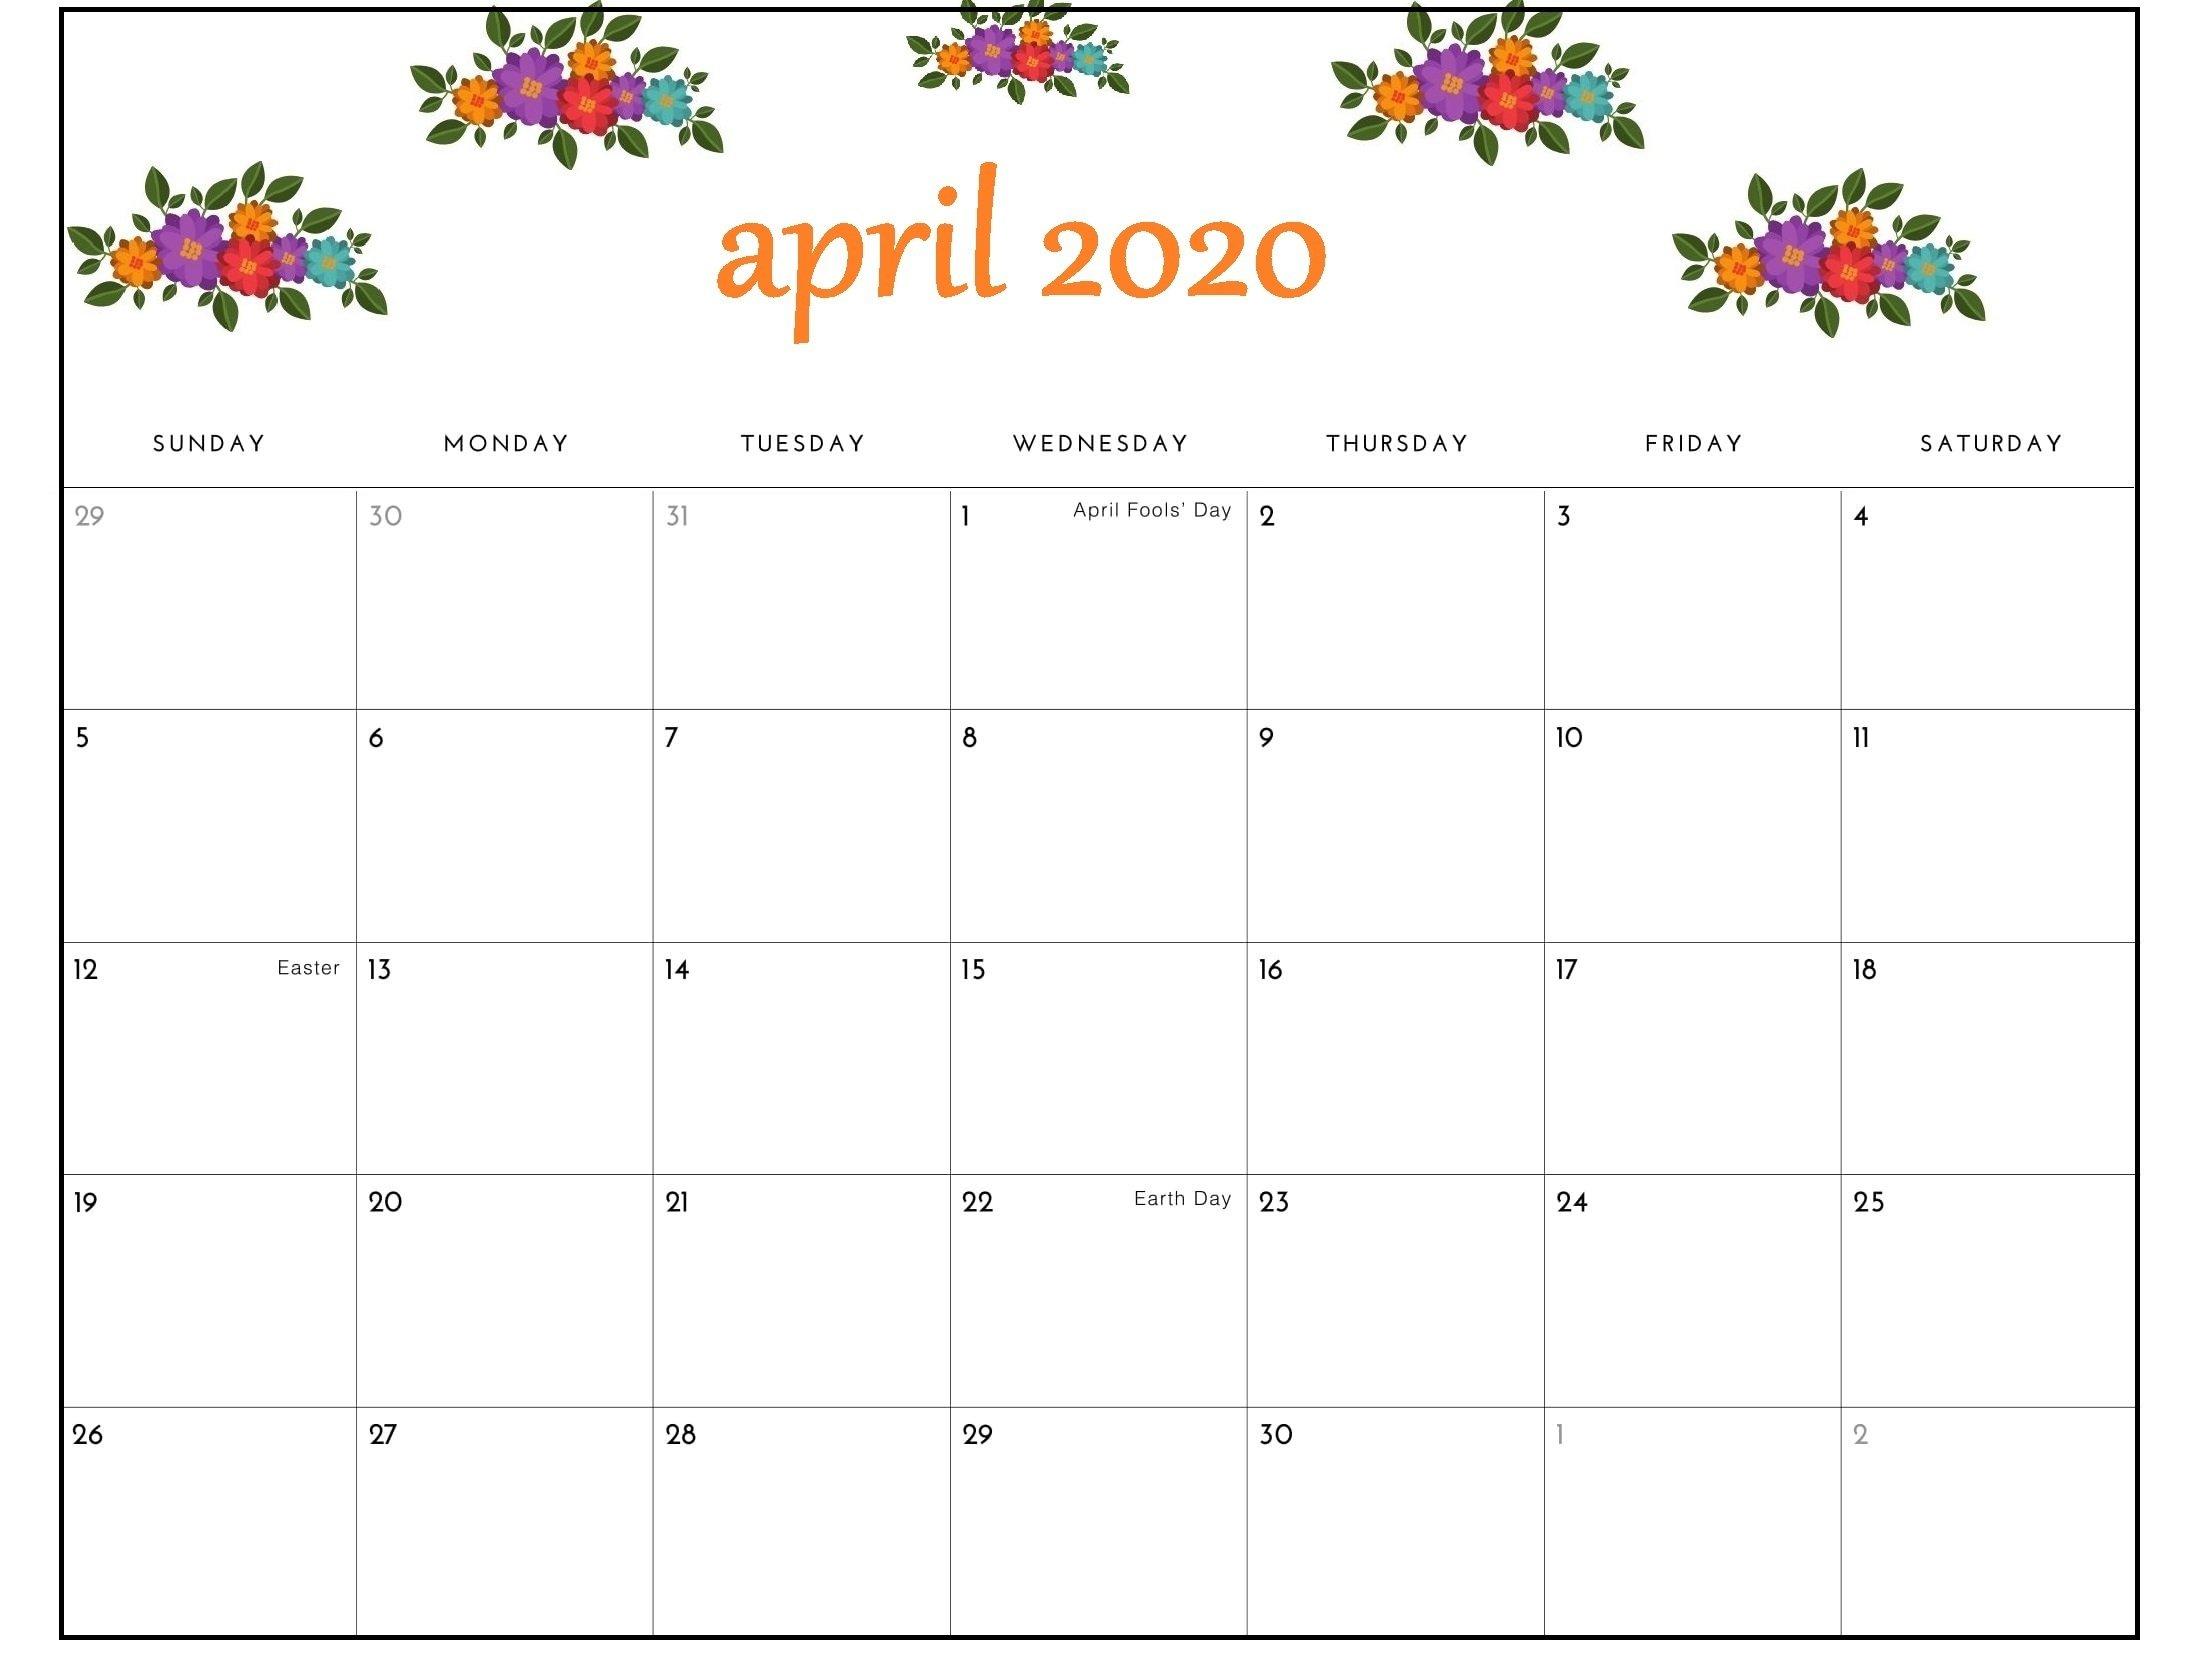 April 2020 Calendar Pdf Sheet For Exam | Free Printable 8X5 Monthly Calendar Print Outs